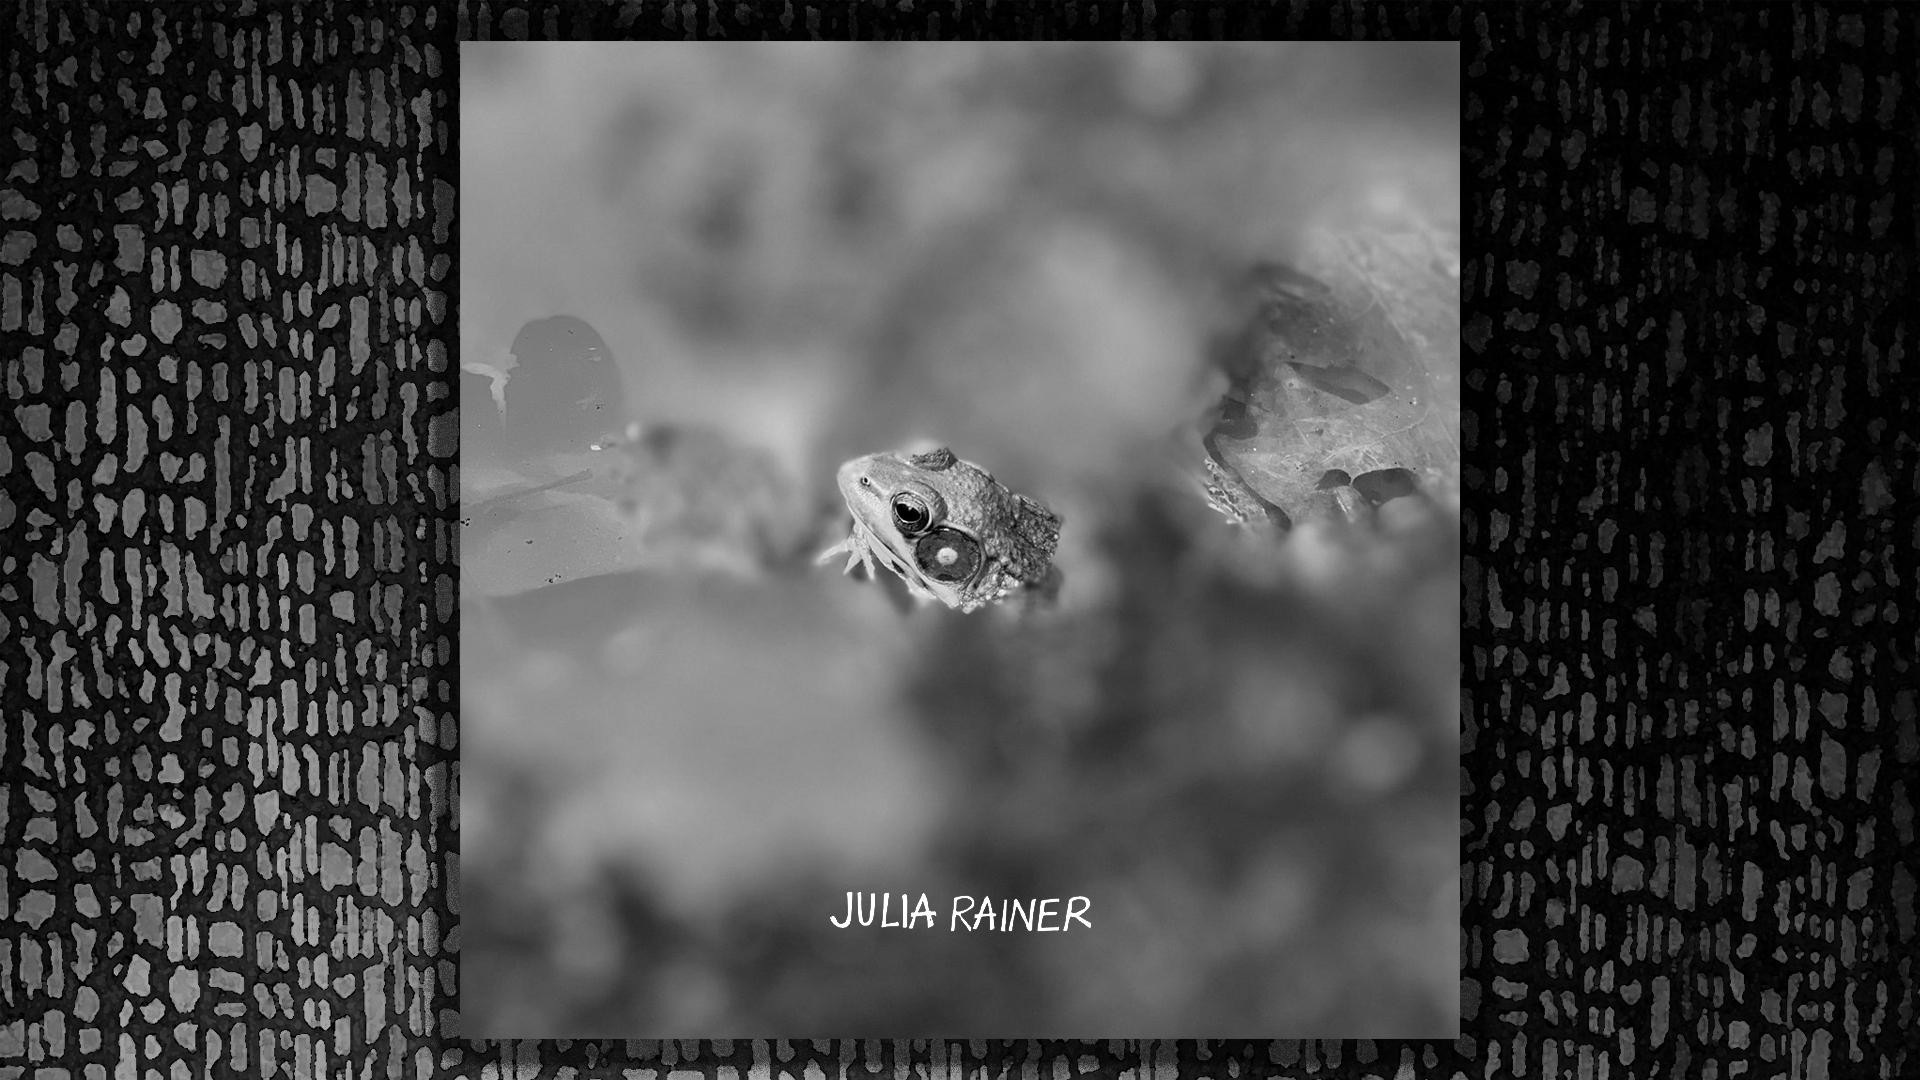 Afraid to Say, Julia Rainer